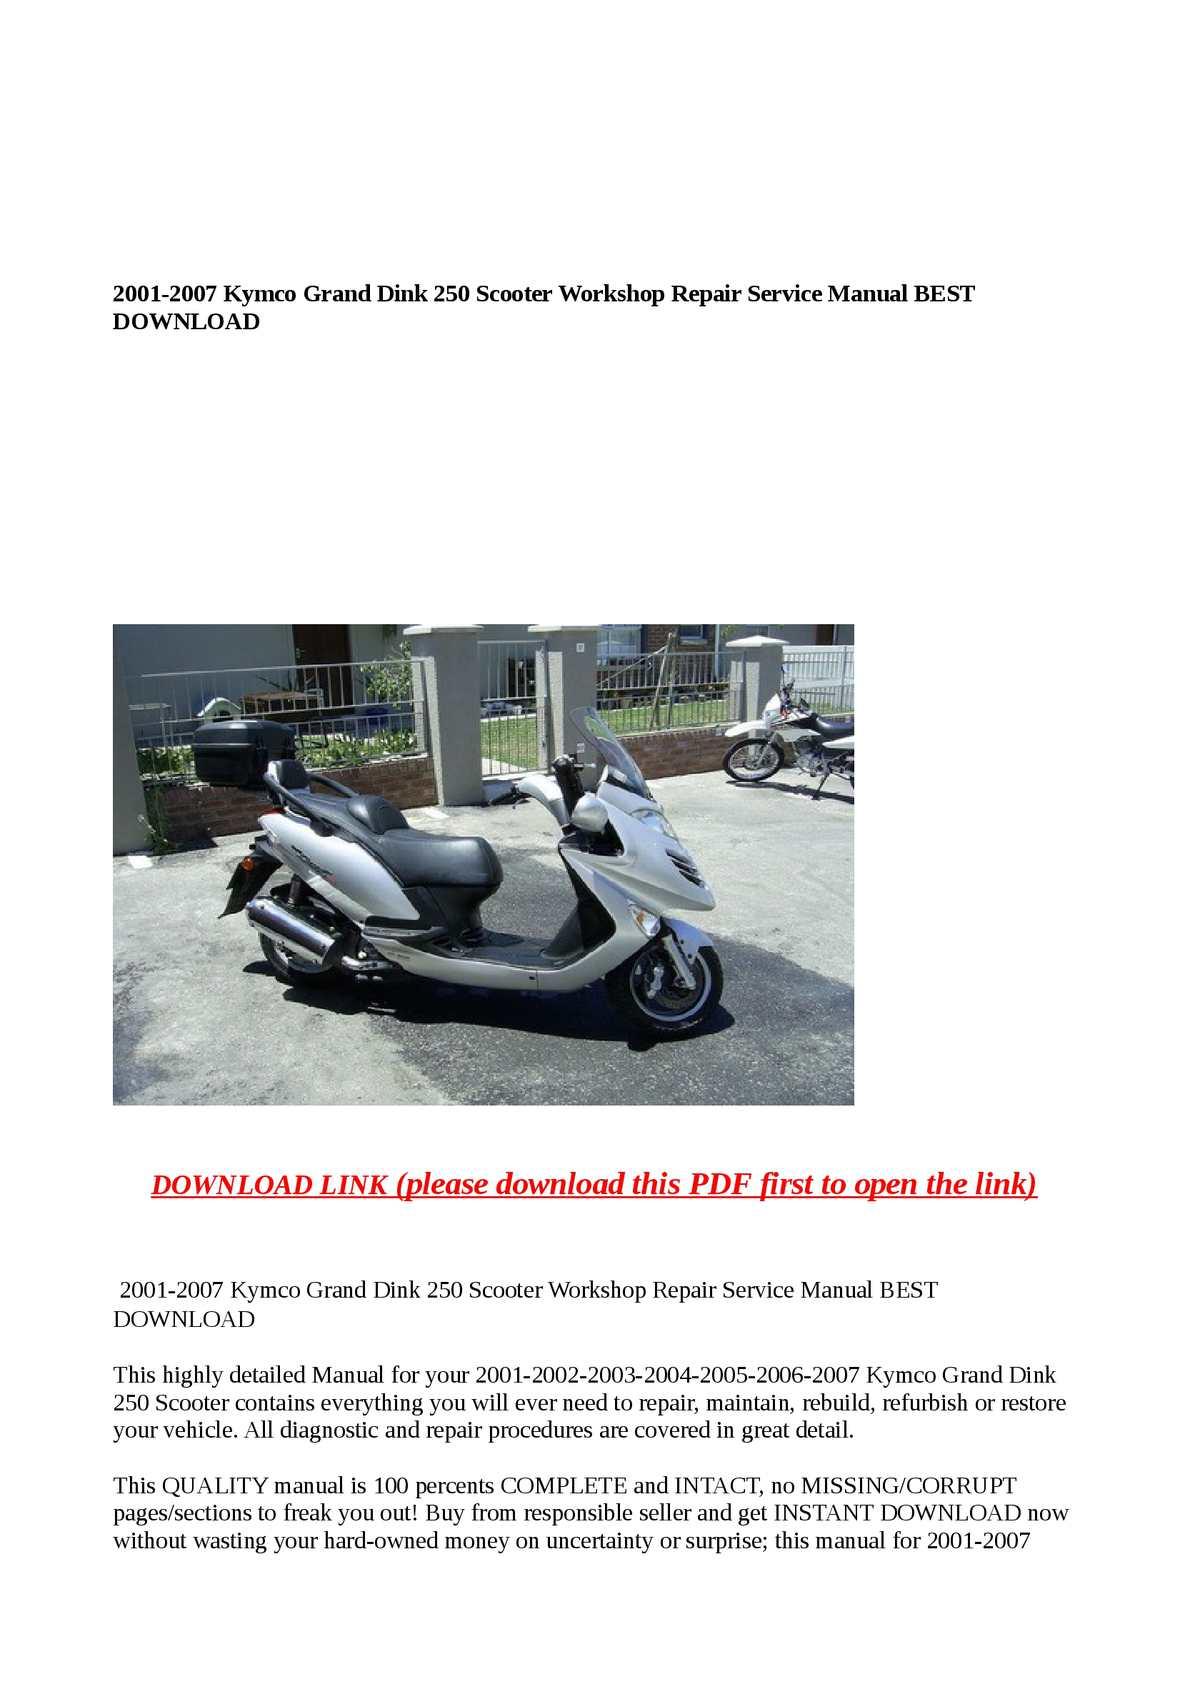 kymco grand dink 250 service reapair workshop manual download